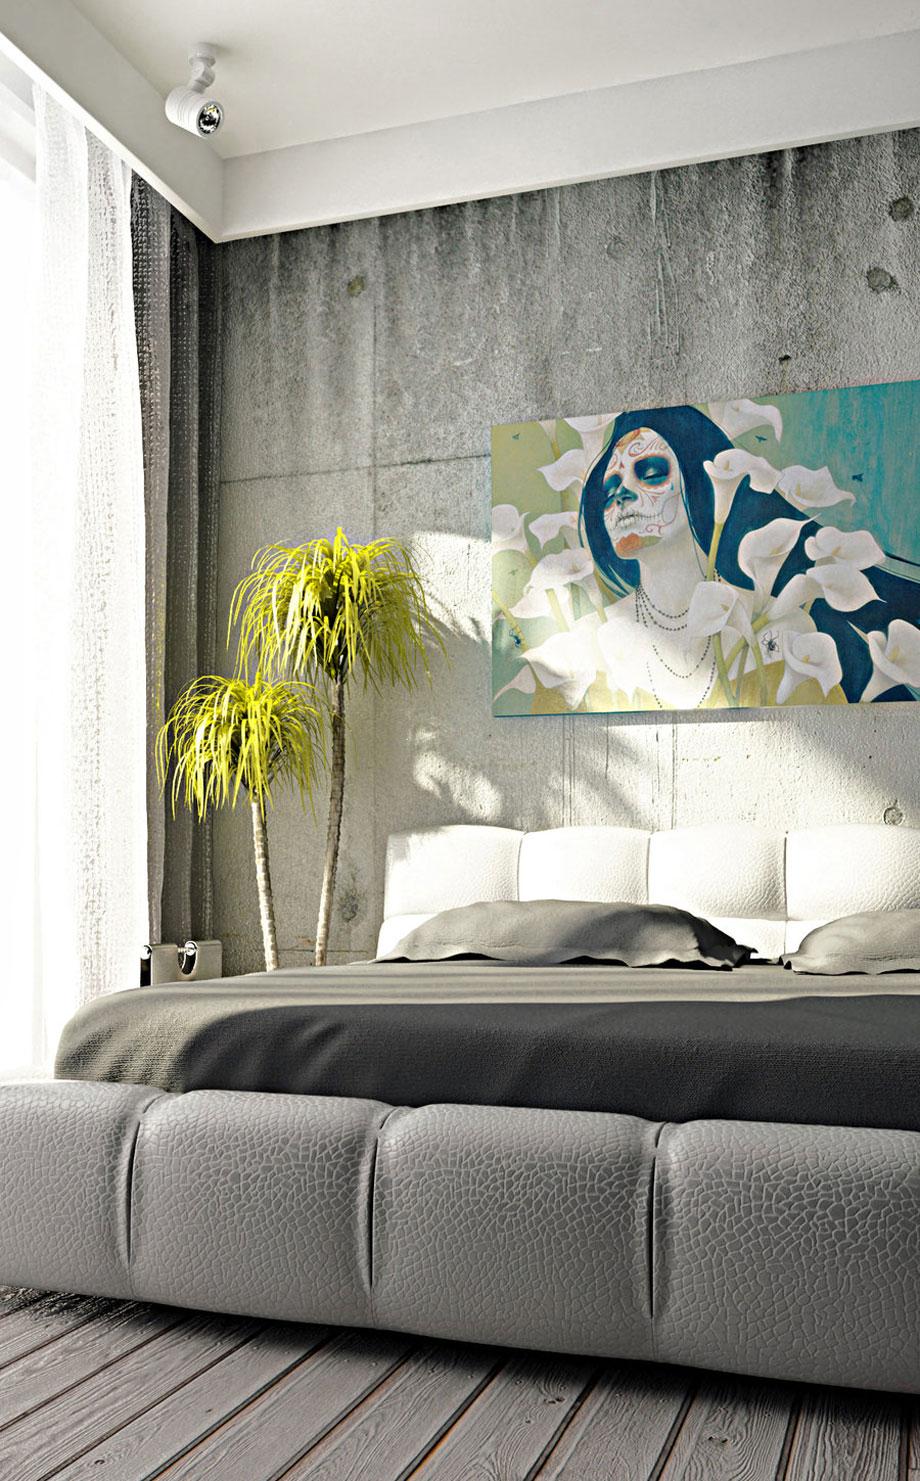 Modern Surreal Art Interior Bedroom Design